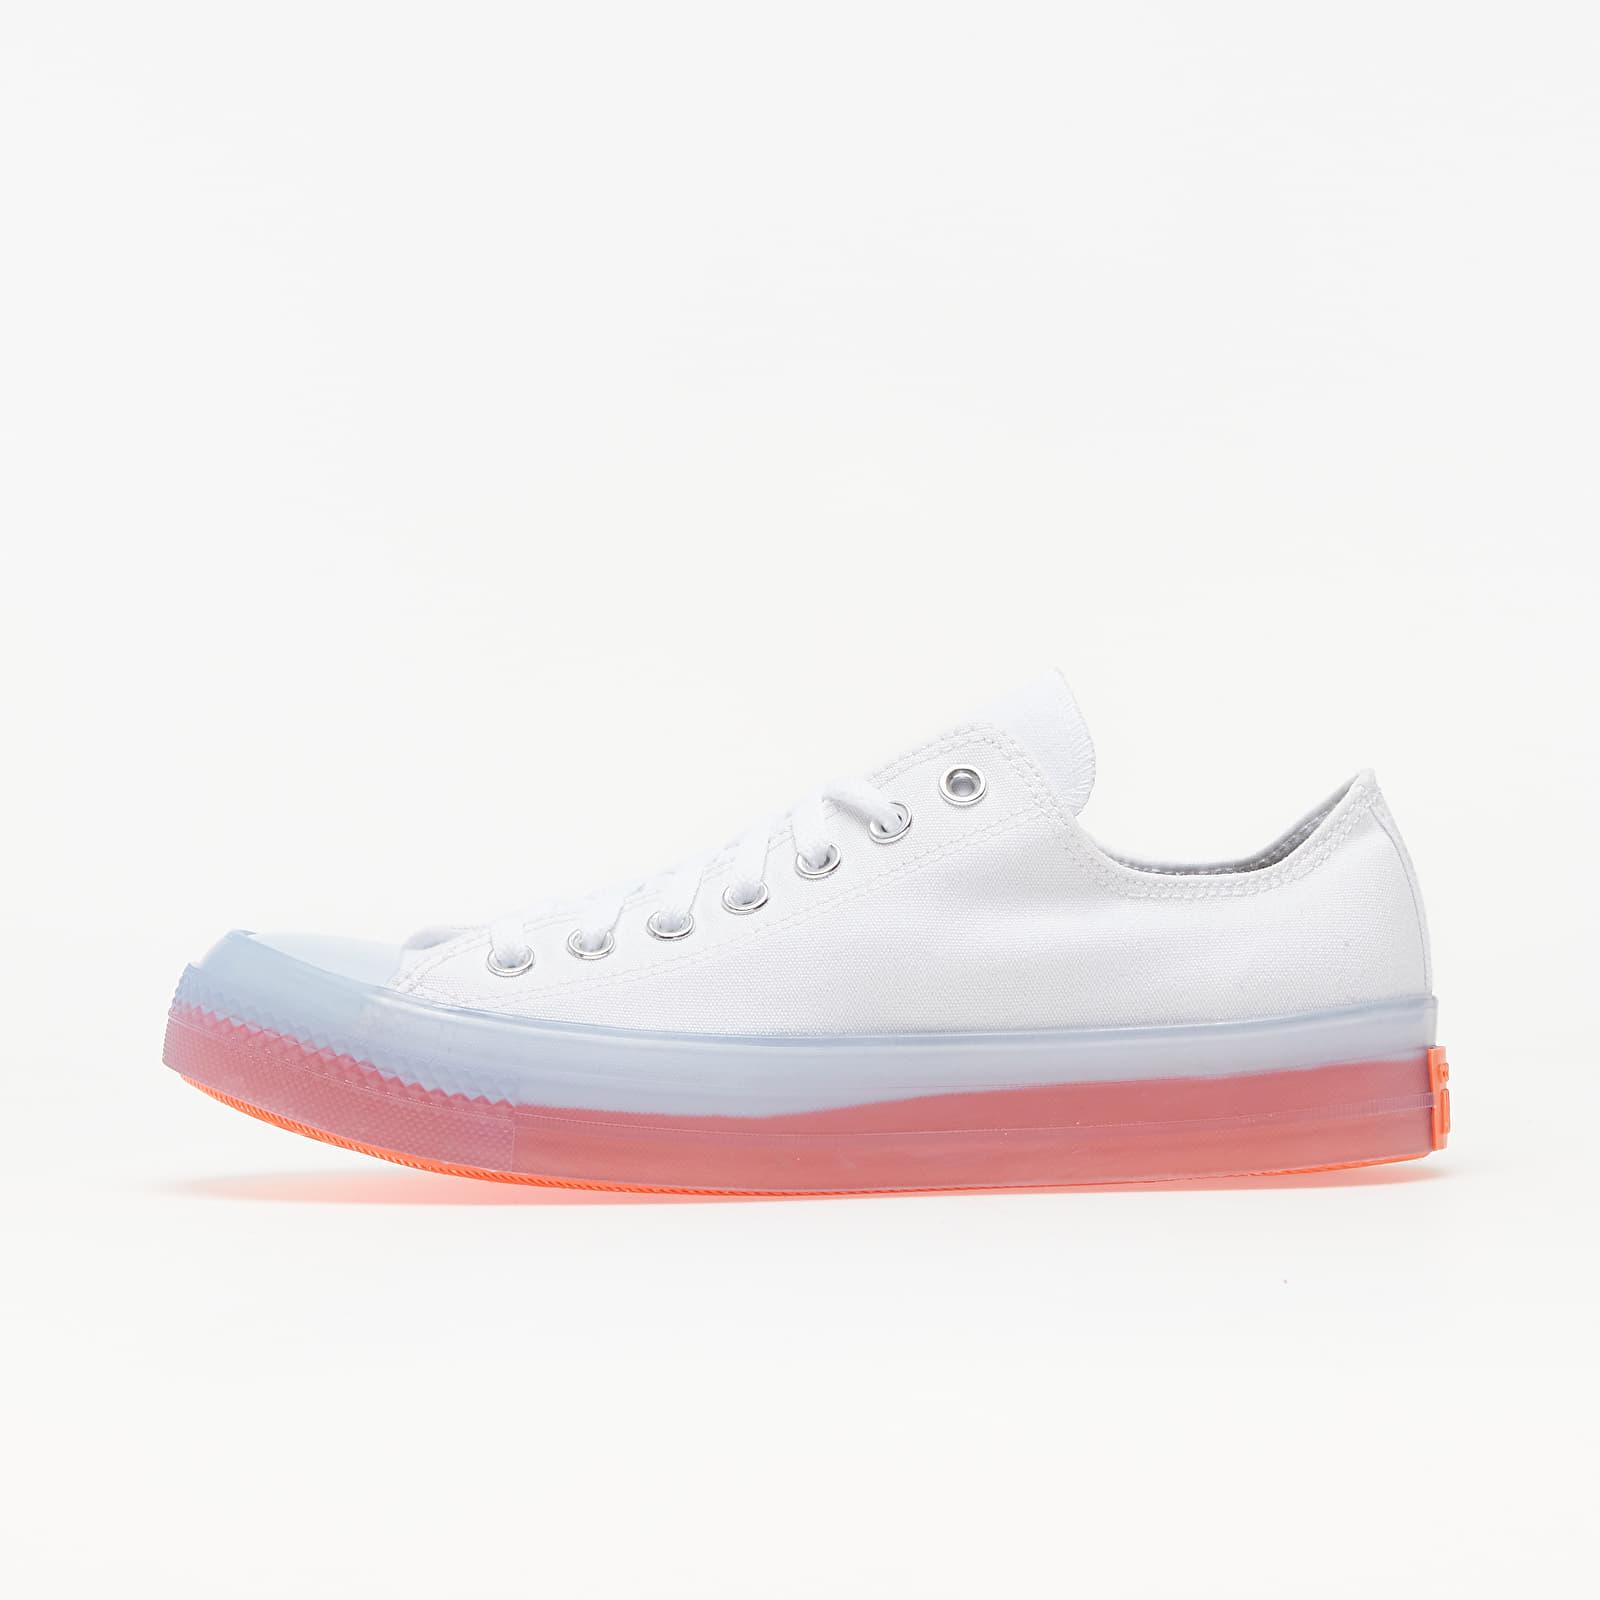 Converse Chuck Taylor All Star CX OX White/ White/ Wild Mango EUR 41.5